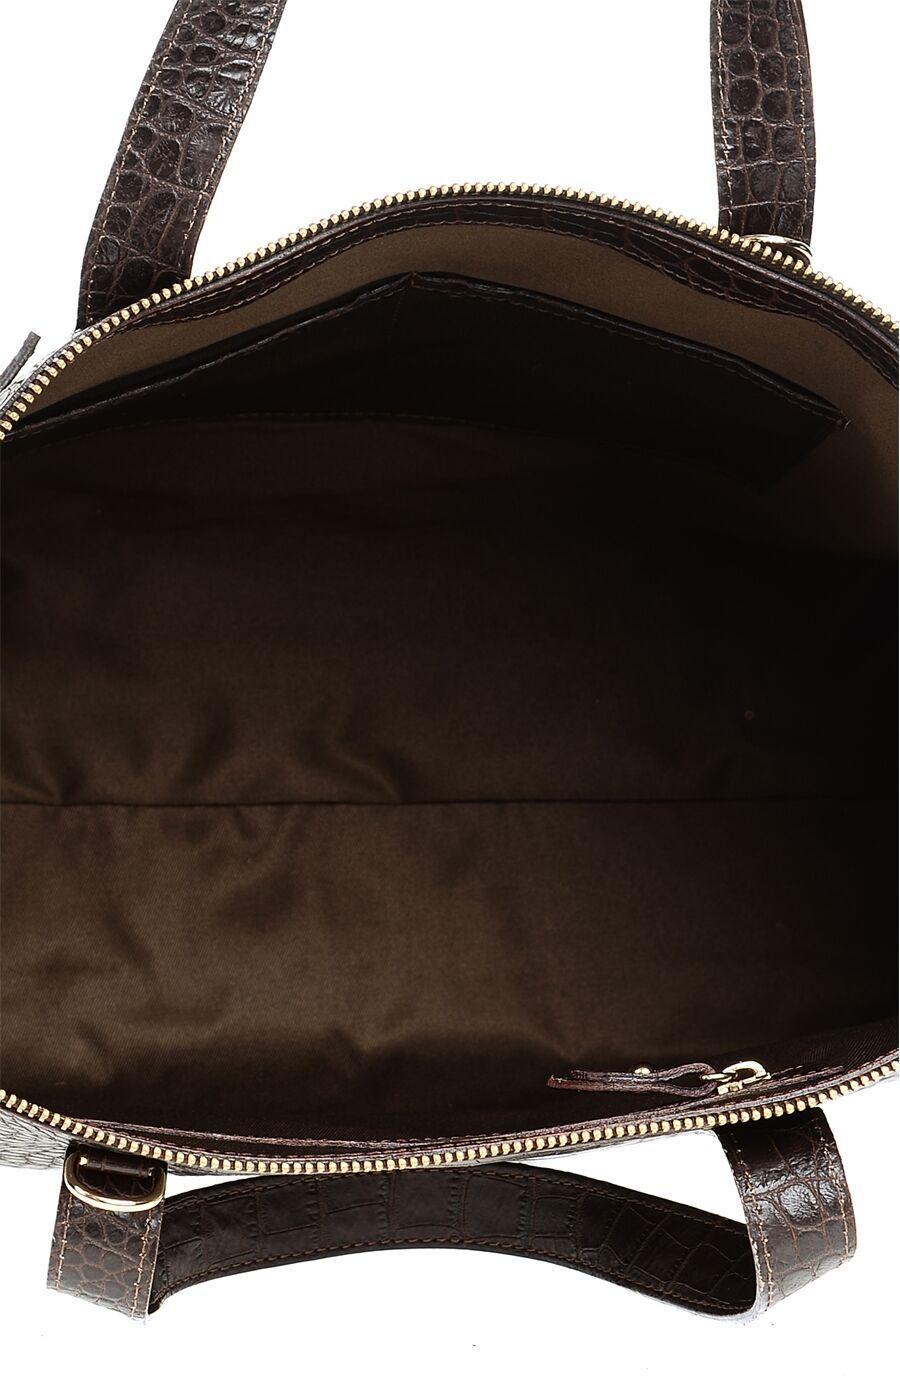 Kahverengi Deri Çanta